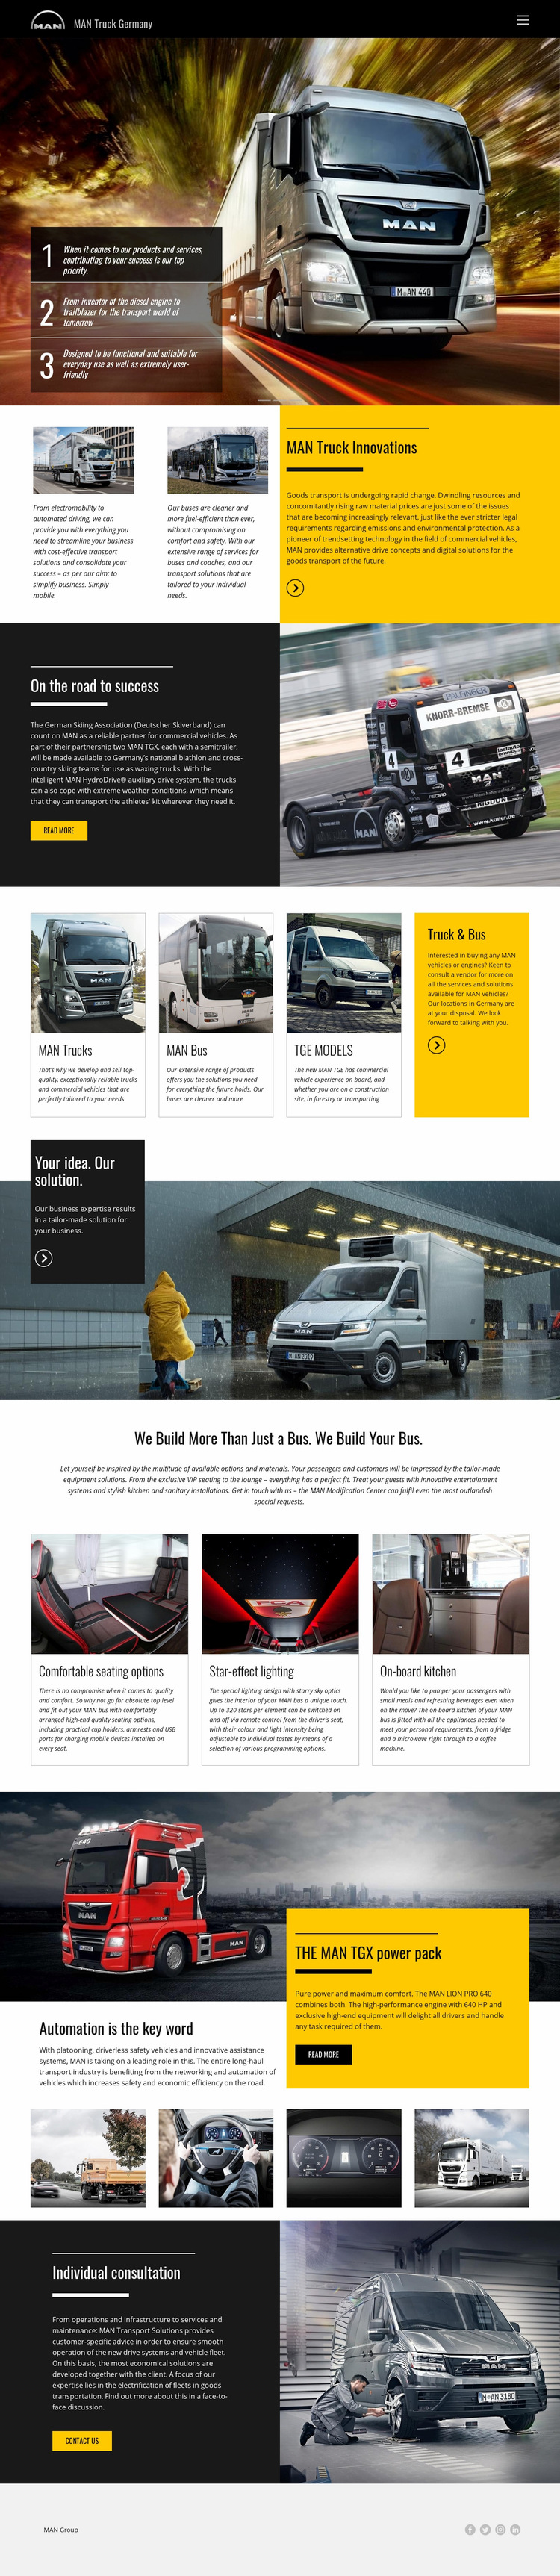 Man trucks for transportation Web Page Design